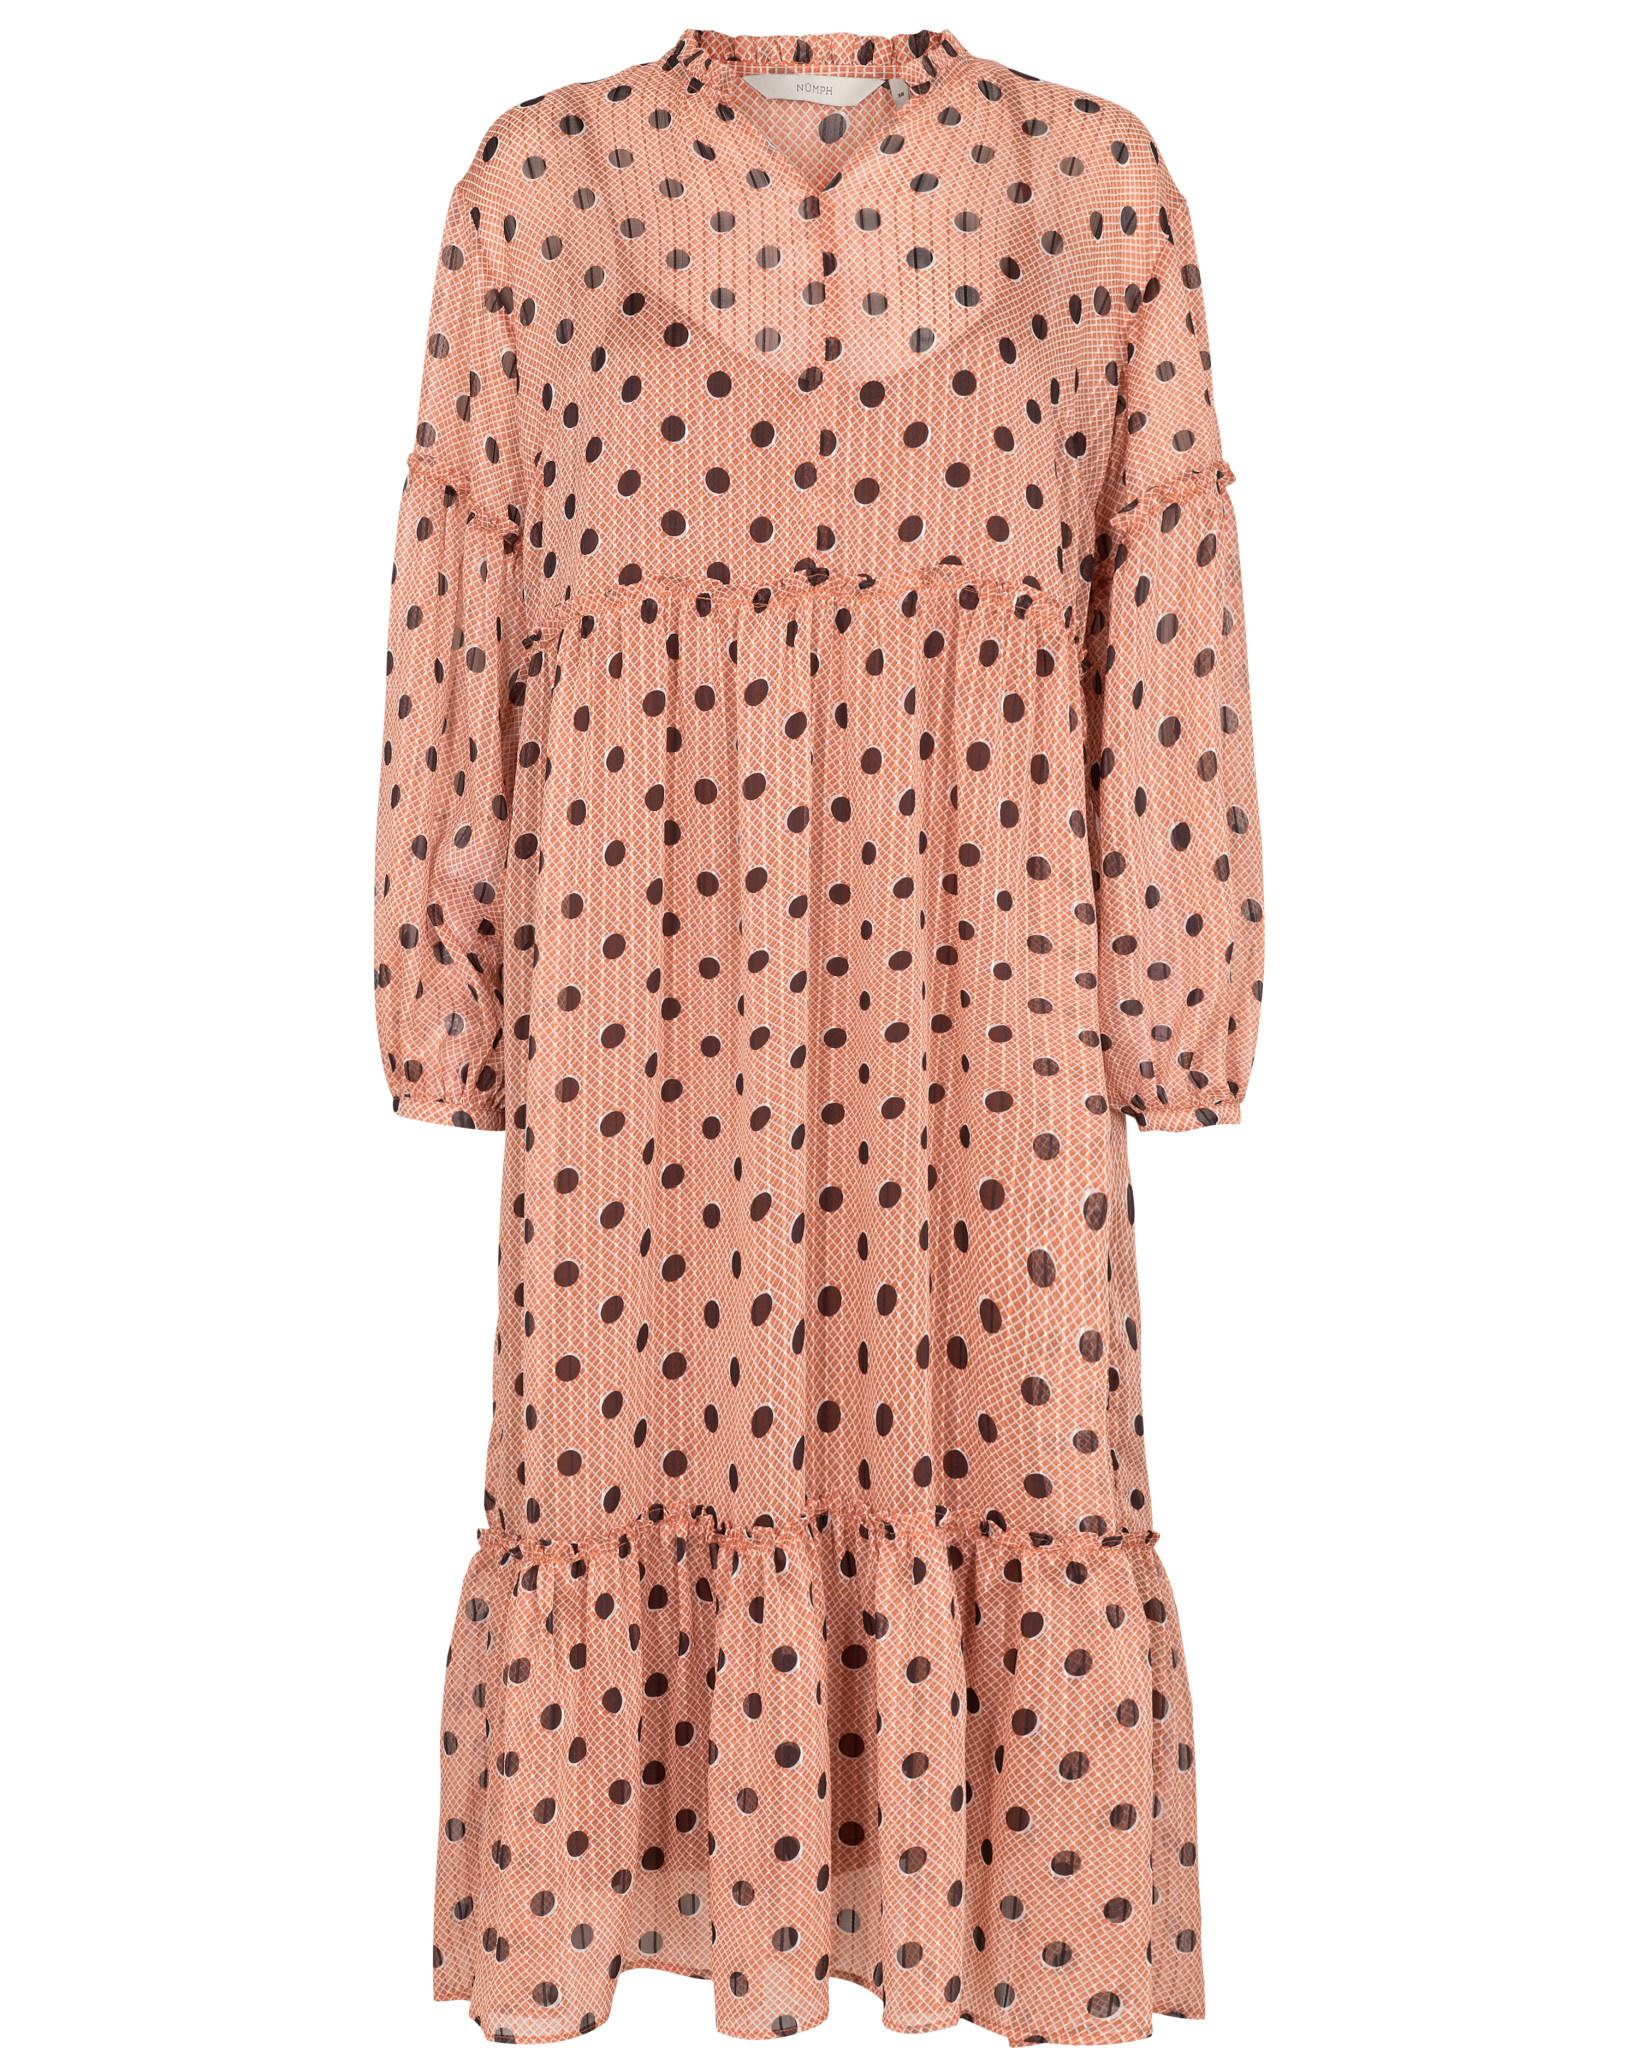 Nümph Nanon Dress - Rose